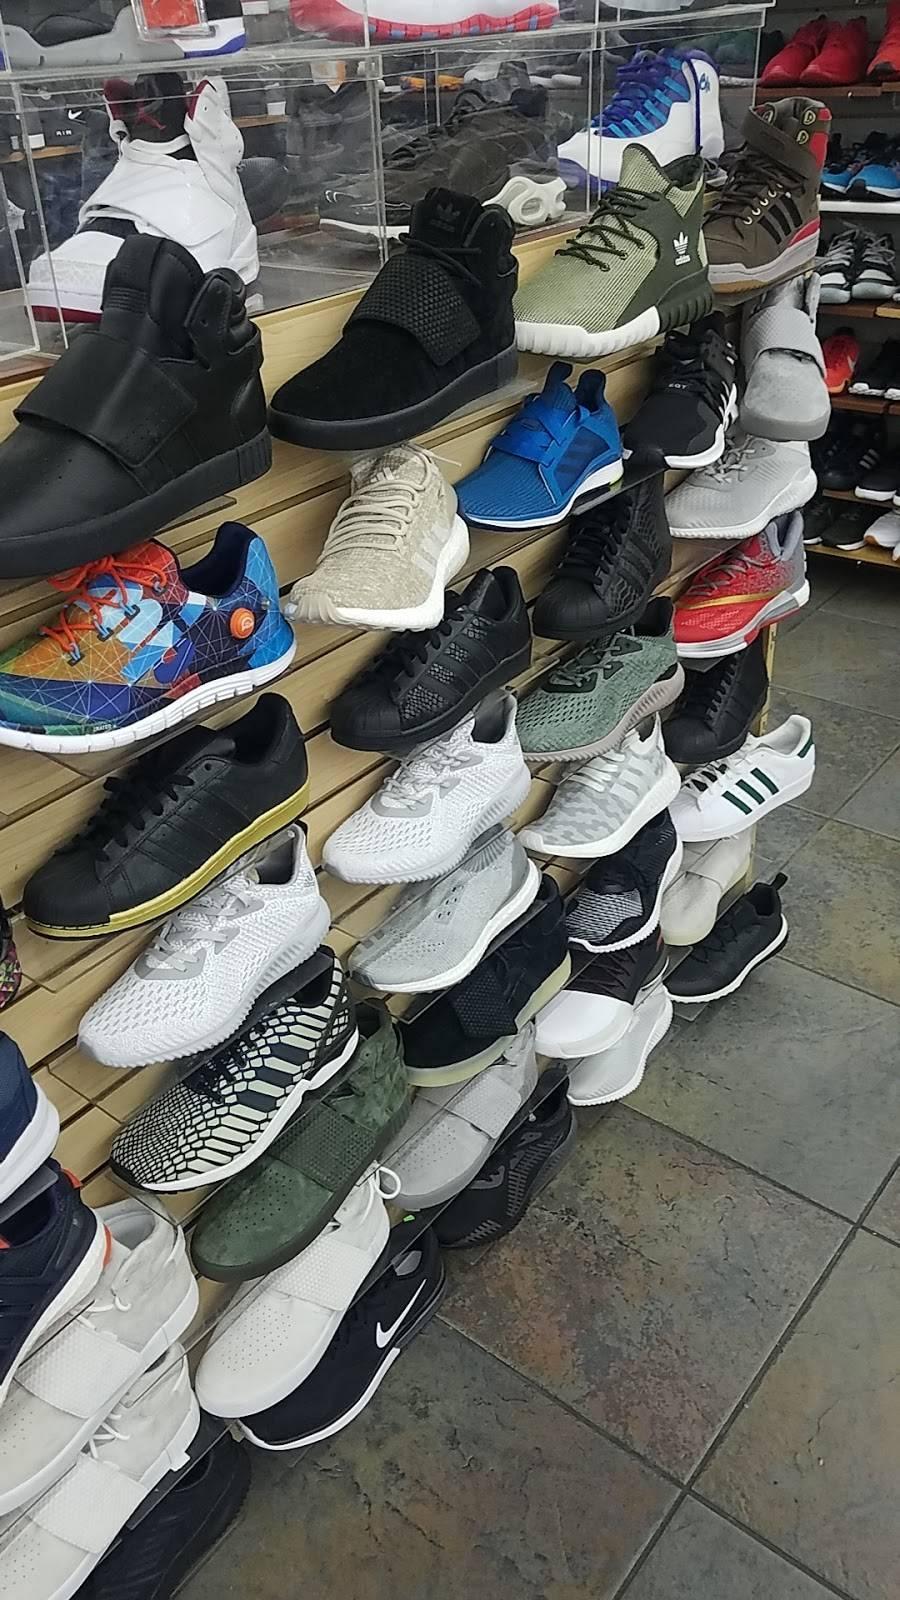 Outlet Shoes & Rugs - shoe store  | Photo 8 of 8 | Address: 221 E Ledbetter Dr, Dallas, TX 75216, USA | Phone: (214) 376-2959